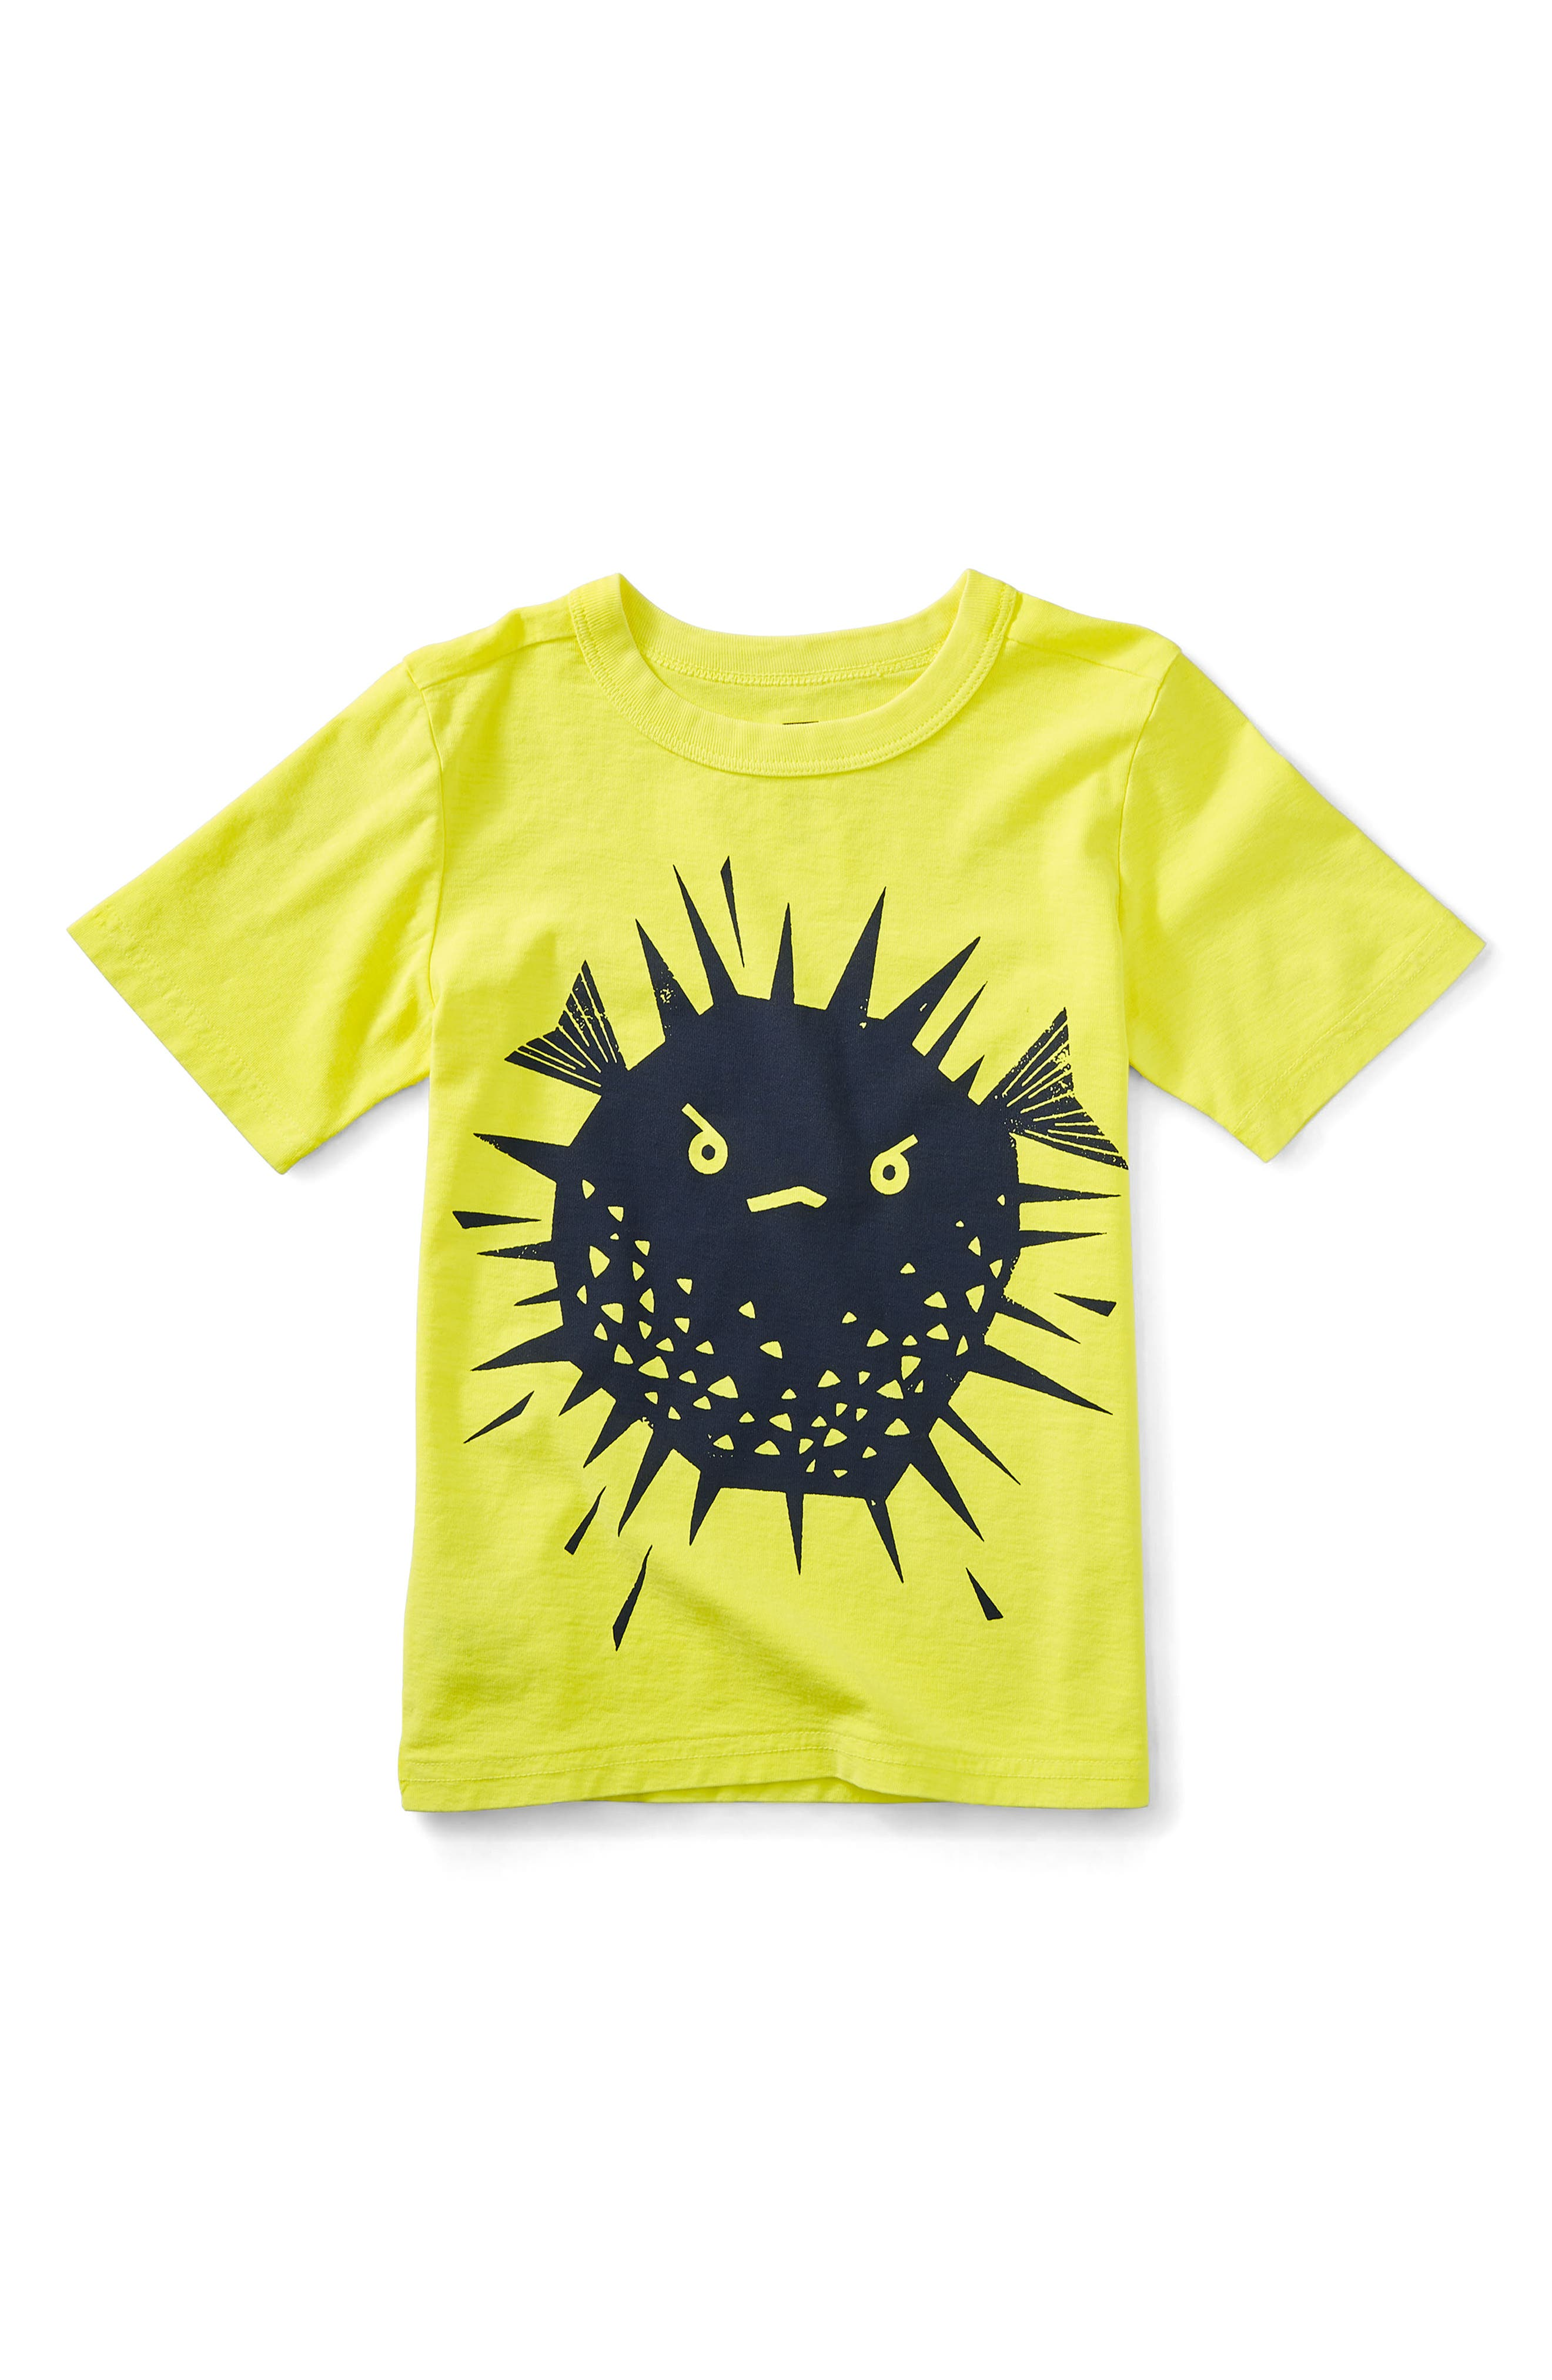 Tea Collection Puffer Fish Graphic T-Shirt (Toddler Boys, Little Boys & Big Boys)